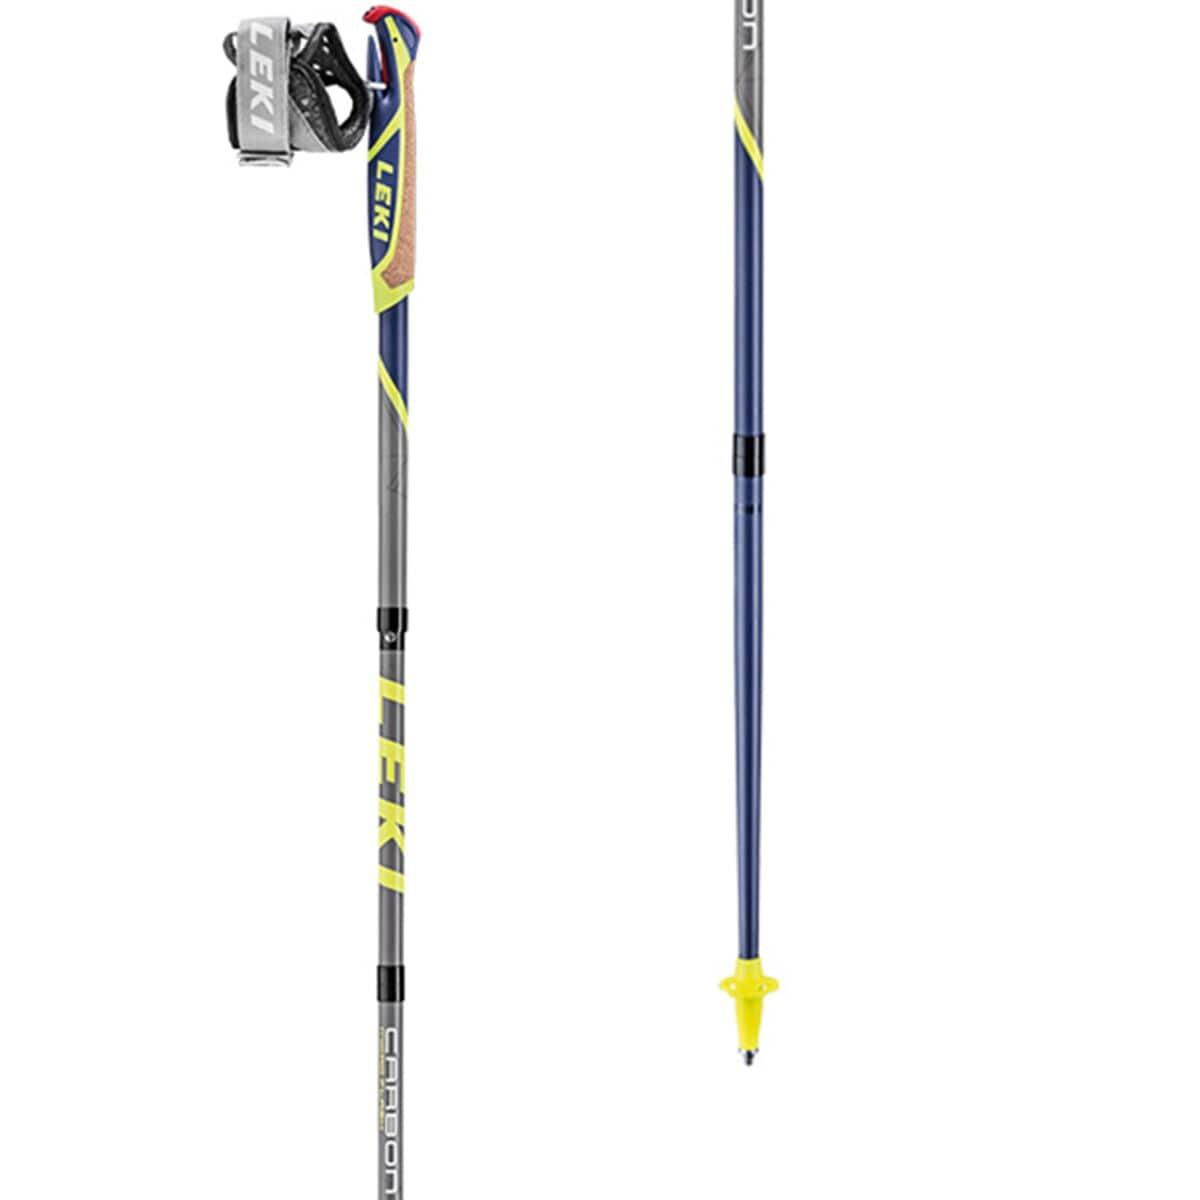 LEKI Micro Flash Carbon Trekking Poles One Color, 110cm